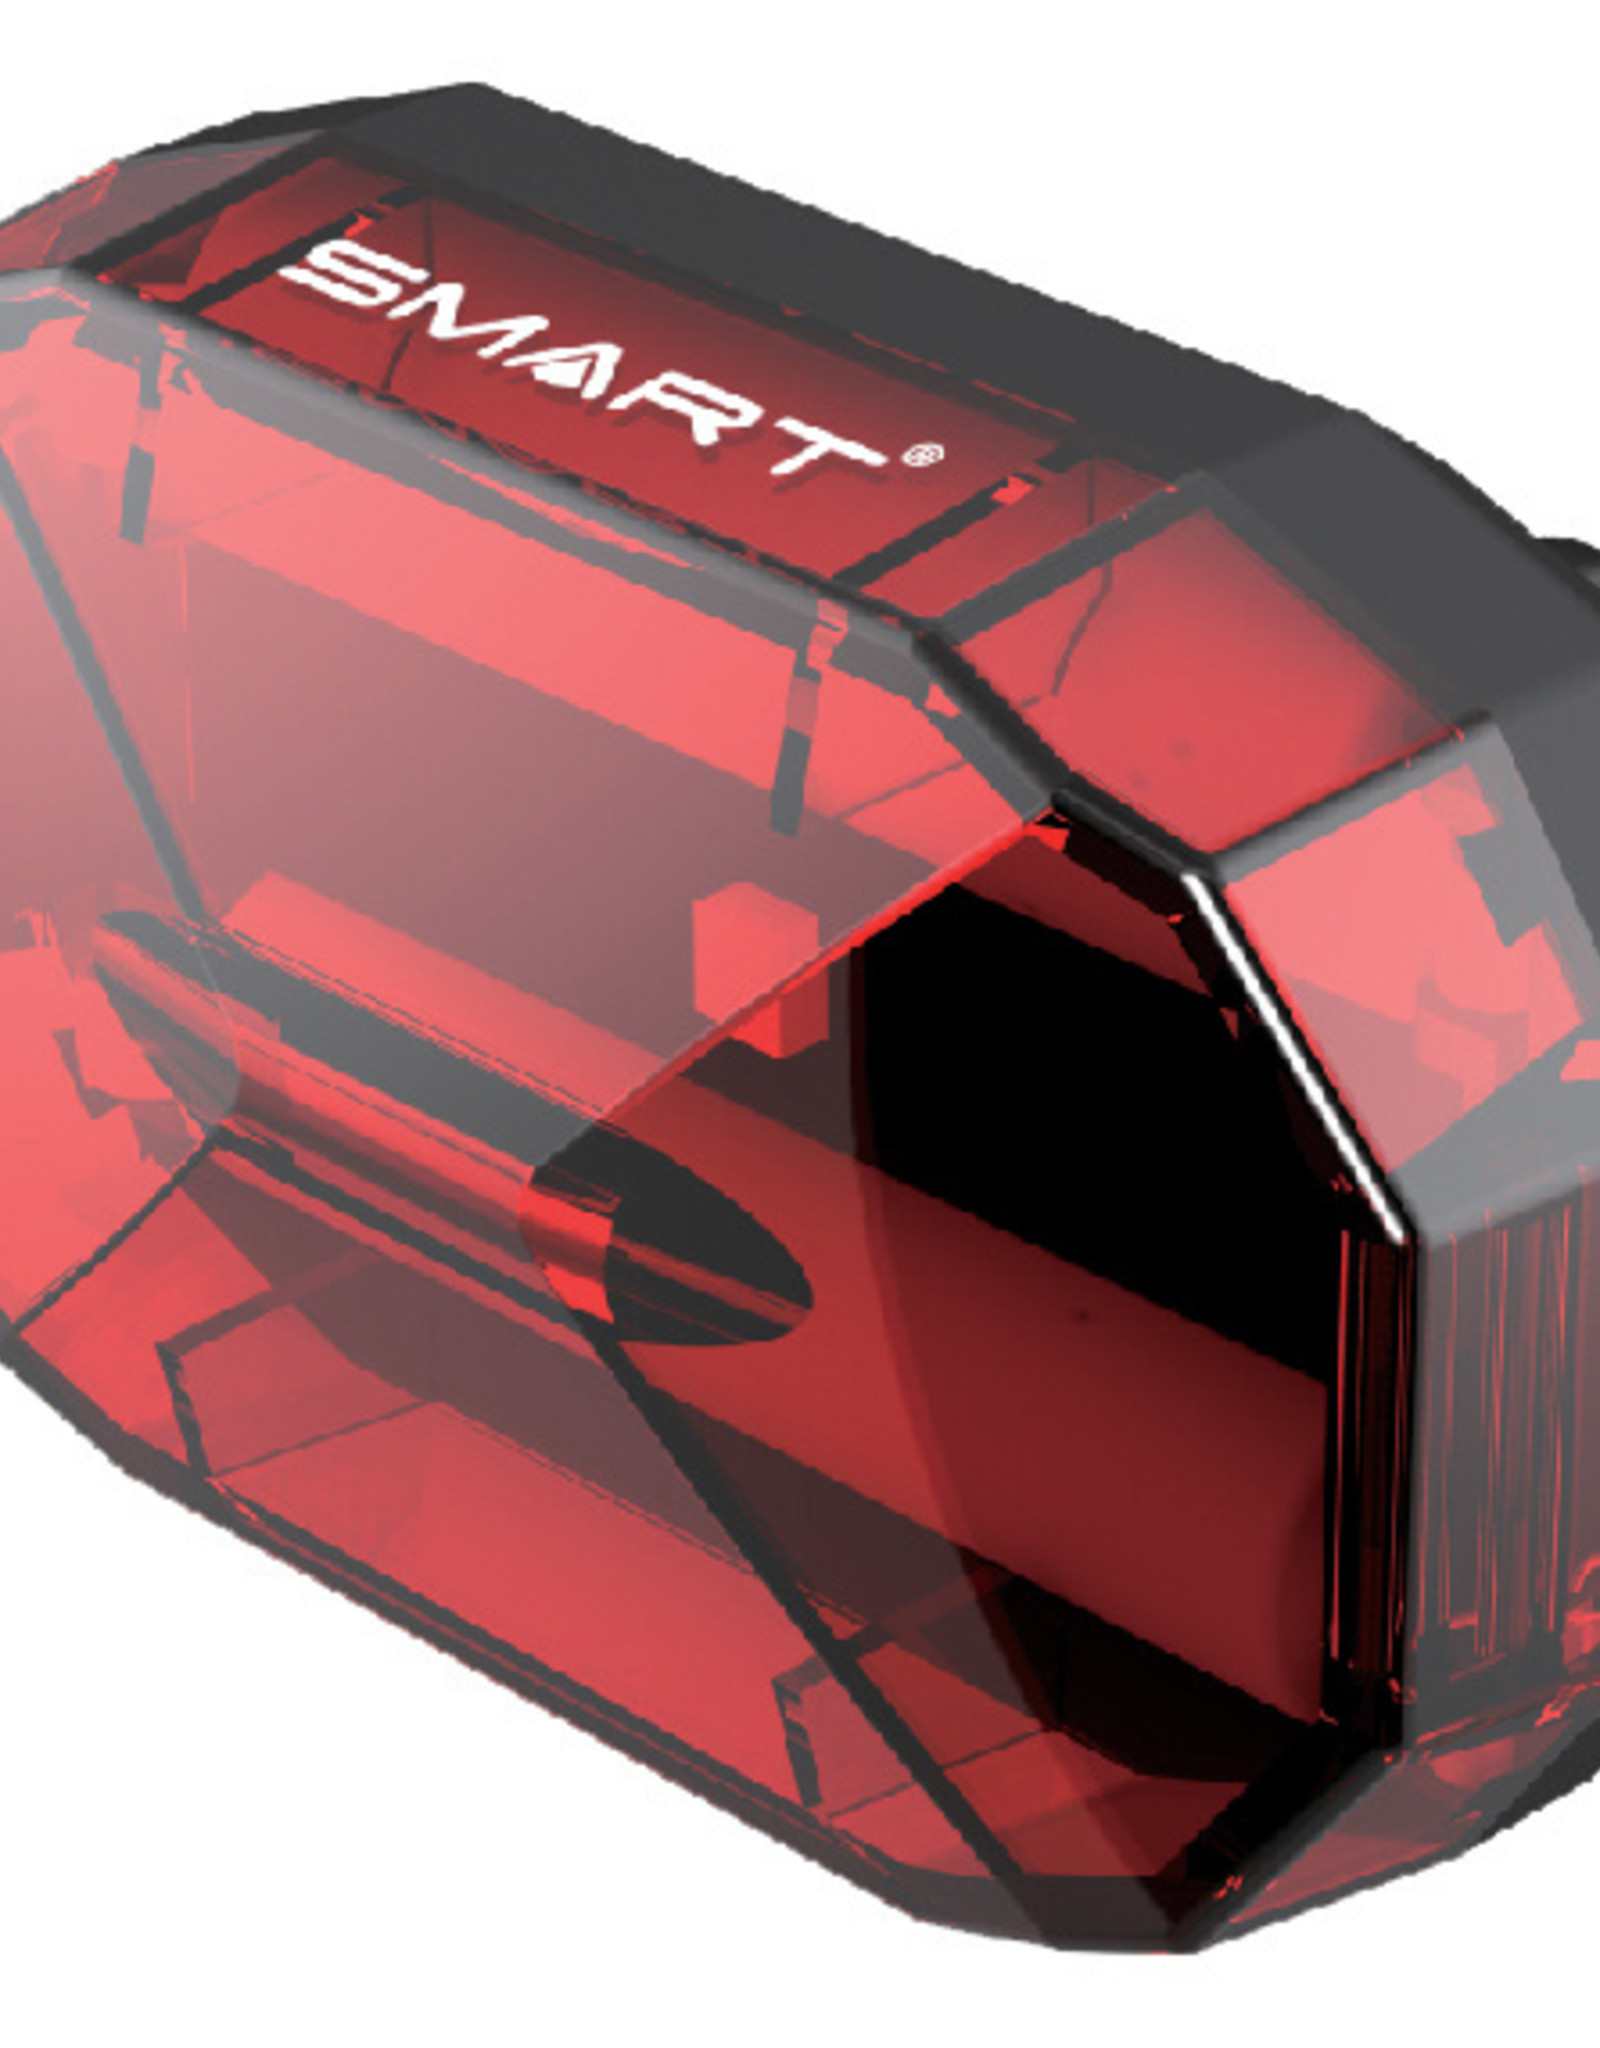 Smart Diamond RL407R - 3 LED Rear Light